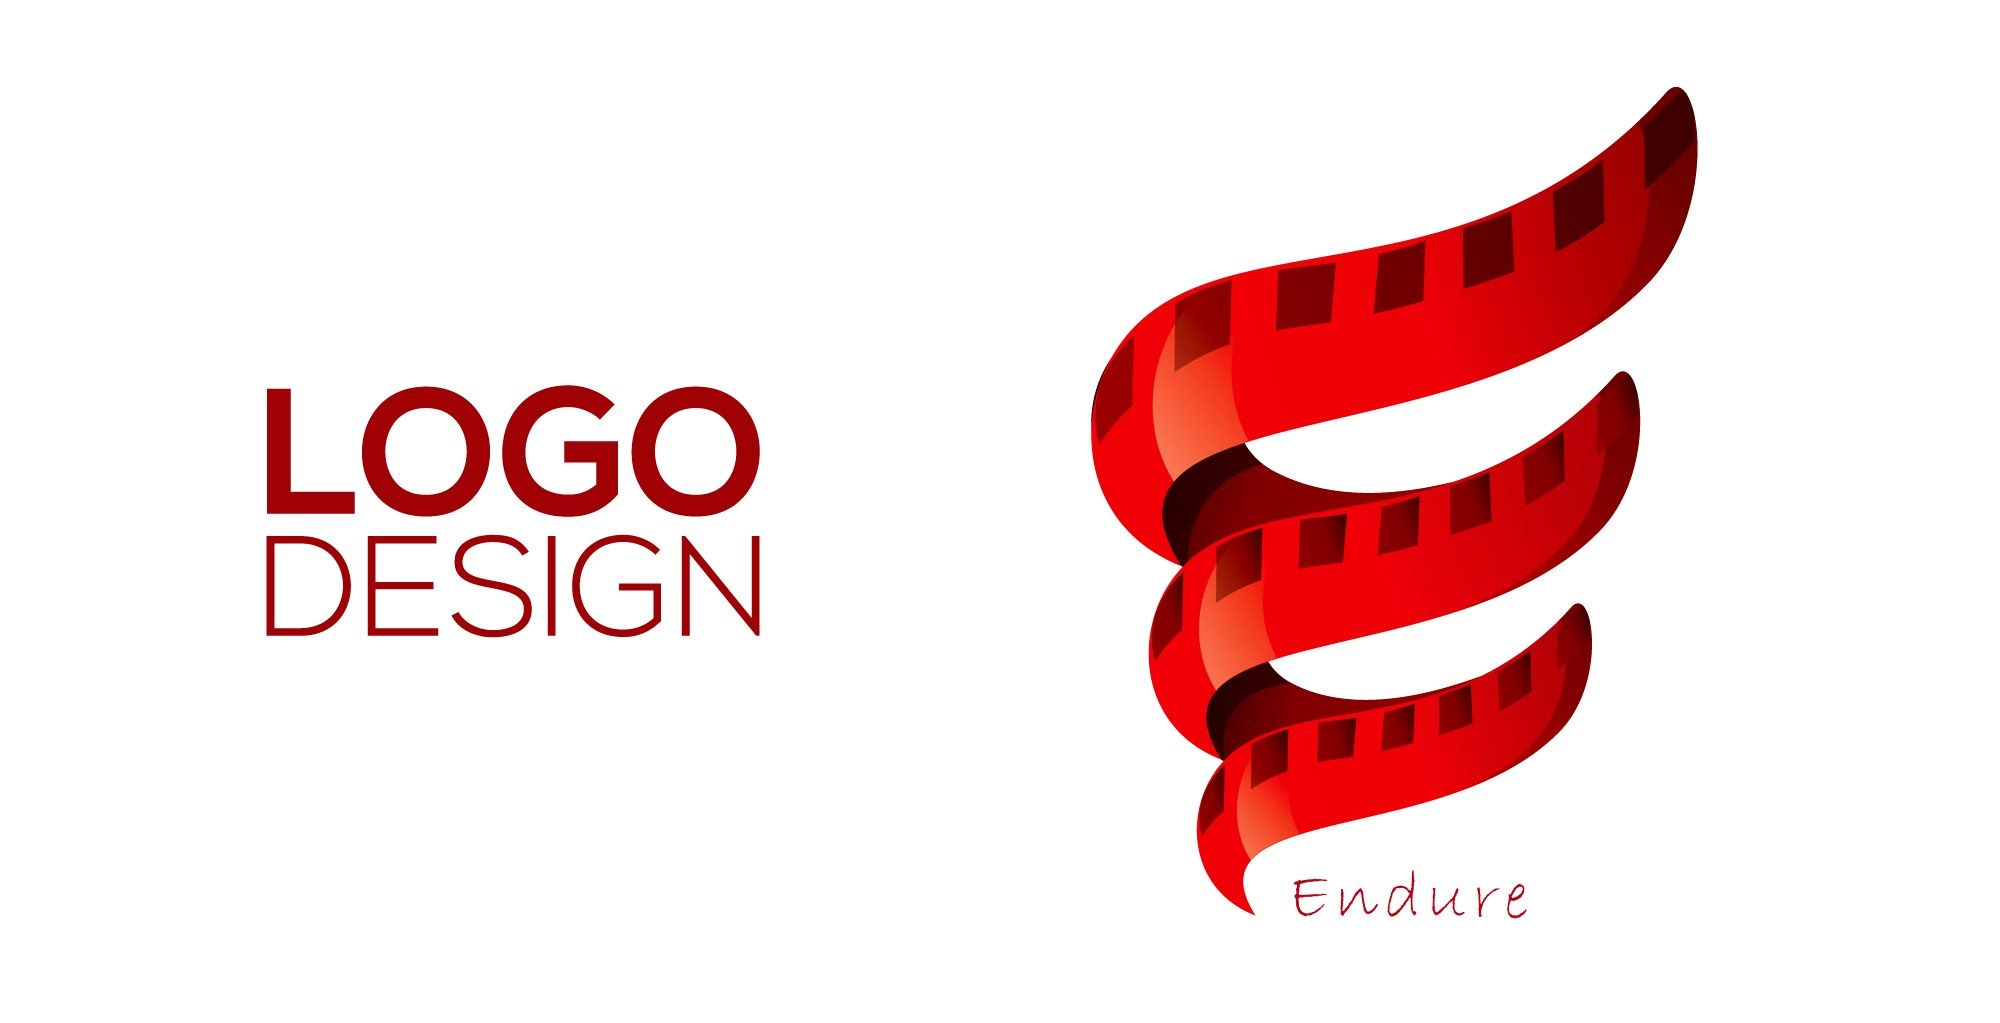 Professional Logo Design Adobe Illustrator Cc Endure Professional Logo Design Logo Design Tutorial Logo Design,Date Of Birth Tattoos Designs